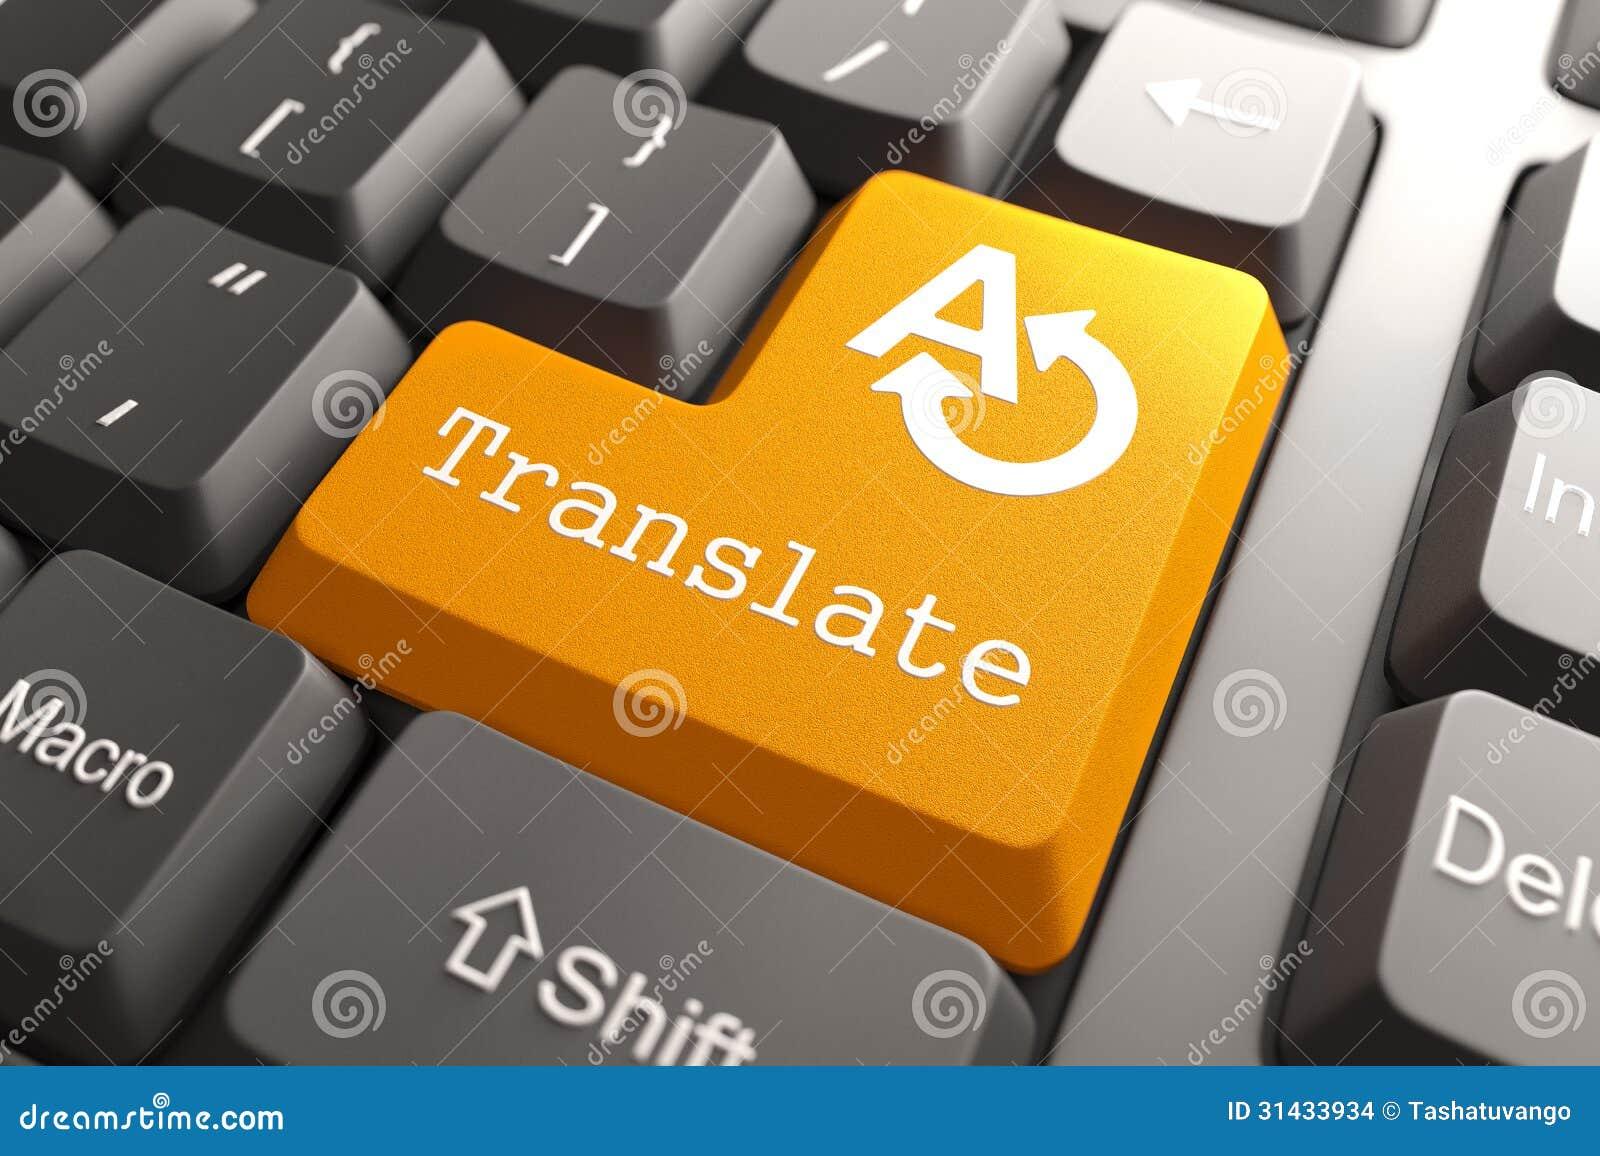 Translate - Keyboard With Translate Button